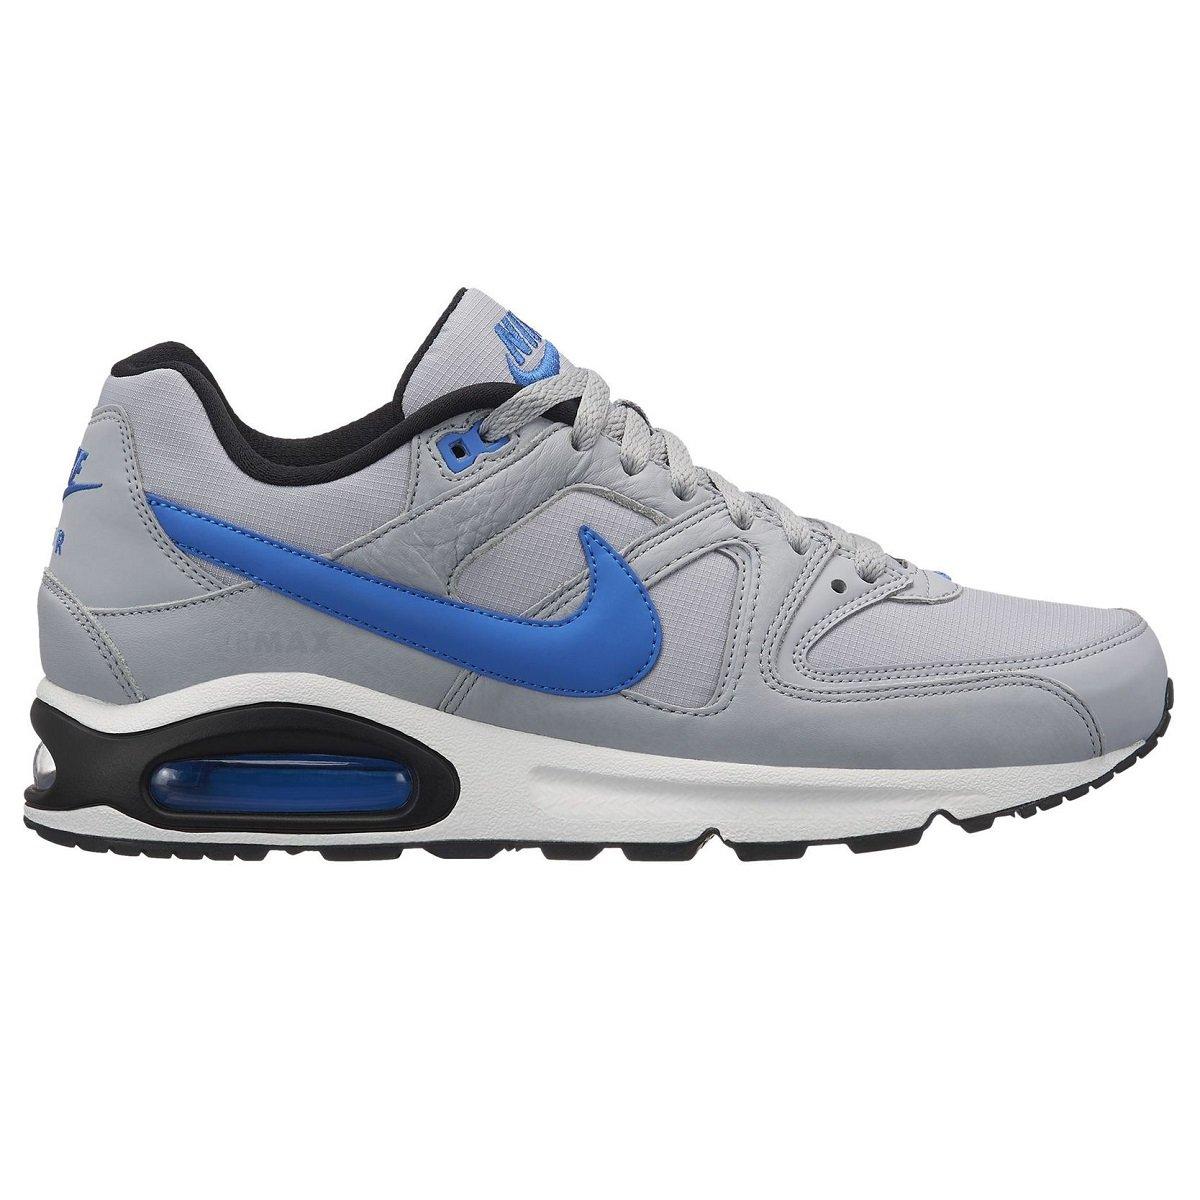 Tênis Masculino Nike Air Max Command 629993-036 - Cinza Azul ... eed4b1d89deb9